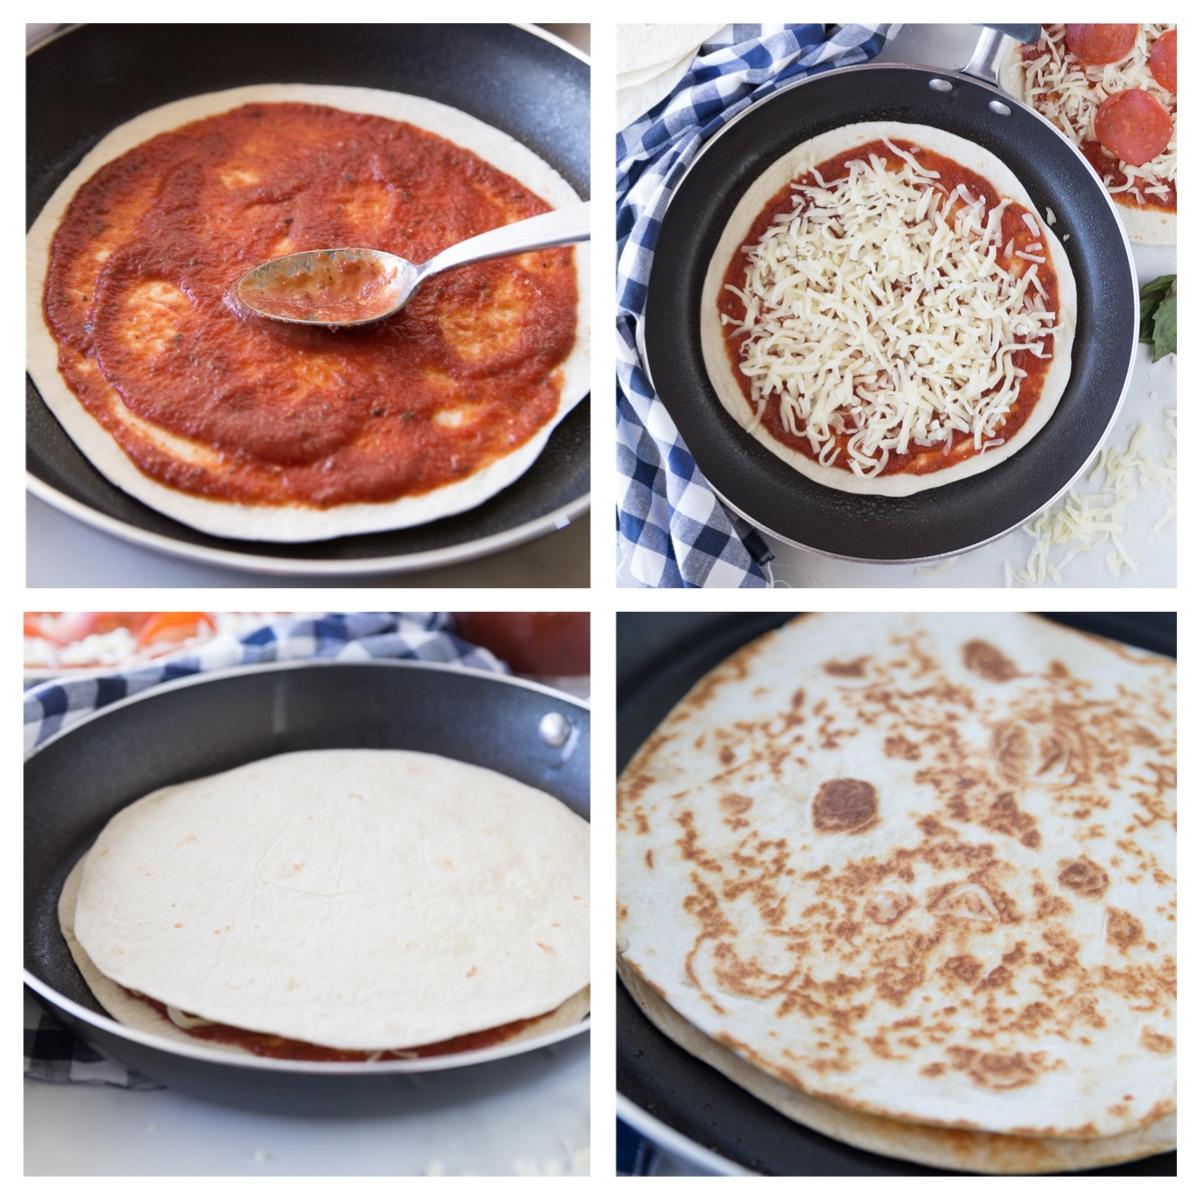 Pizza Quesadilla steps